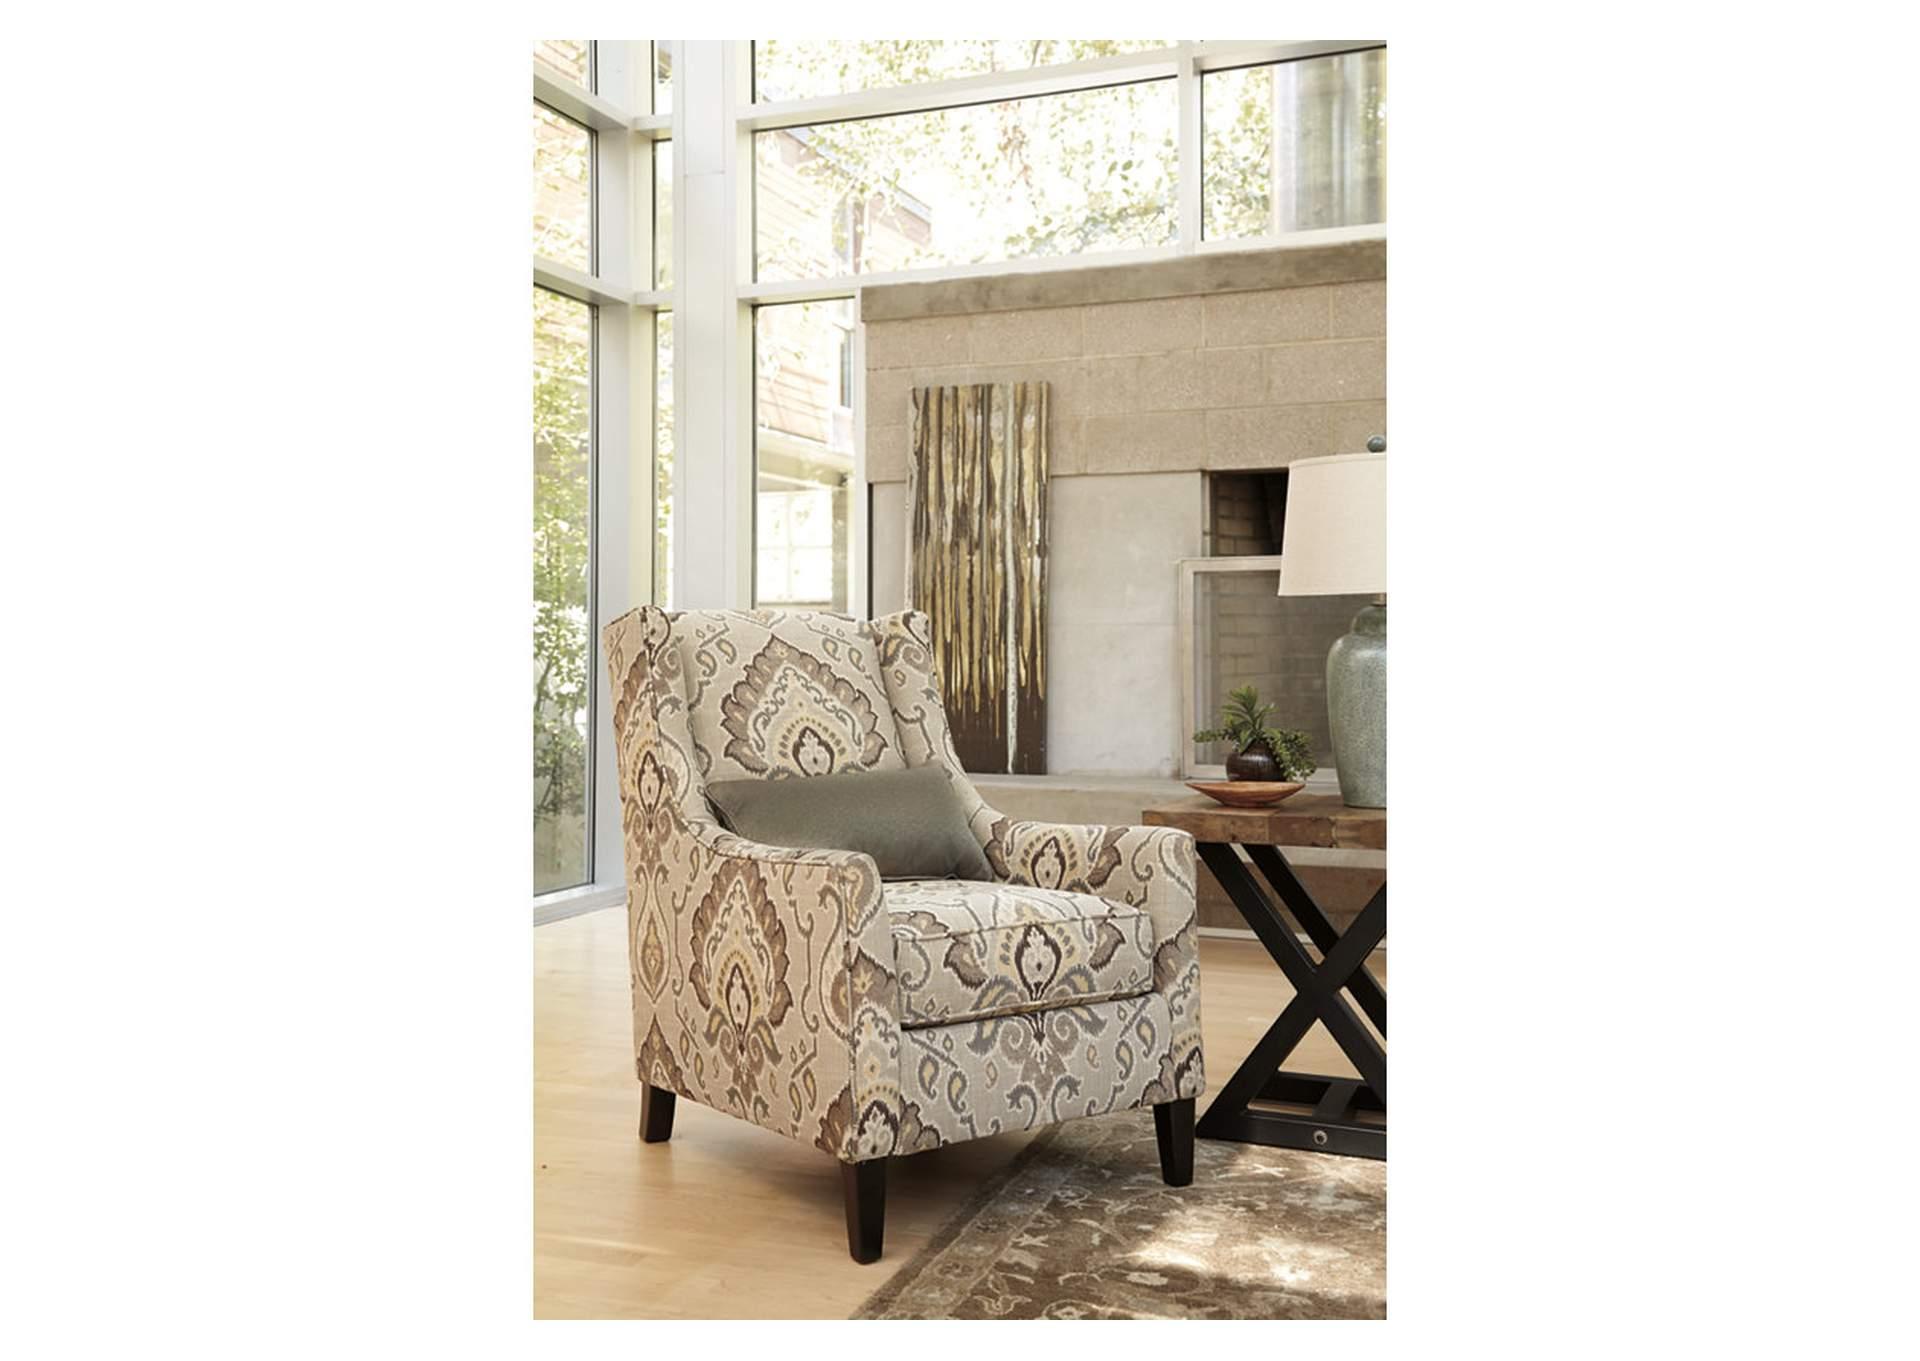 Sensational Star Furniture Wilcot Shale Accent Chair Creativecarmelina Interior Chair Design Creativecarmelinacom